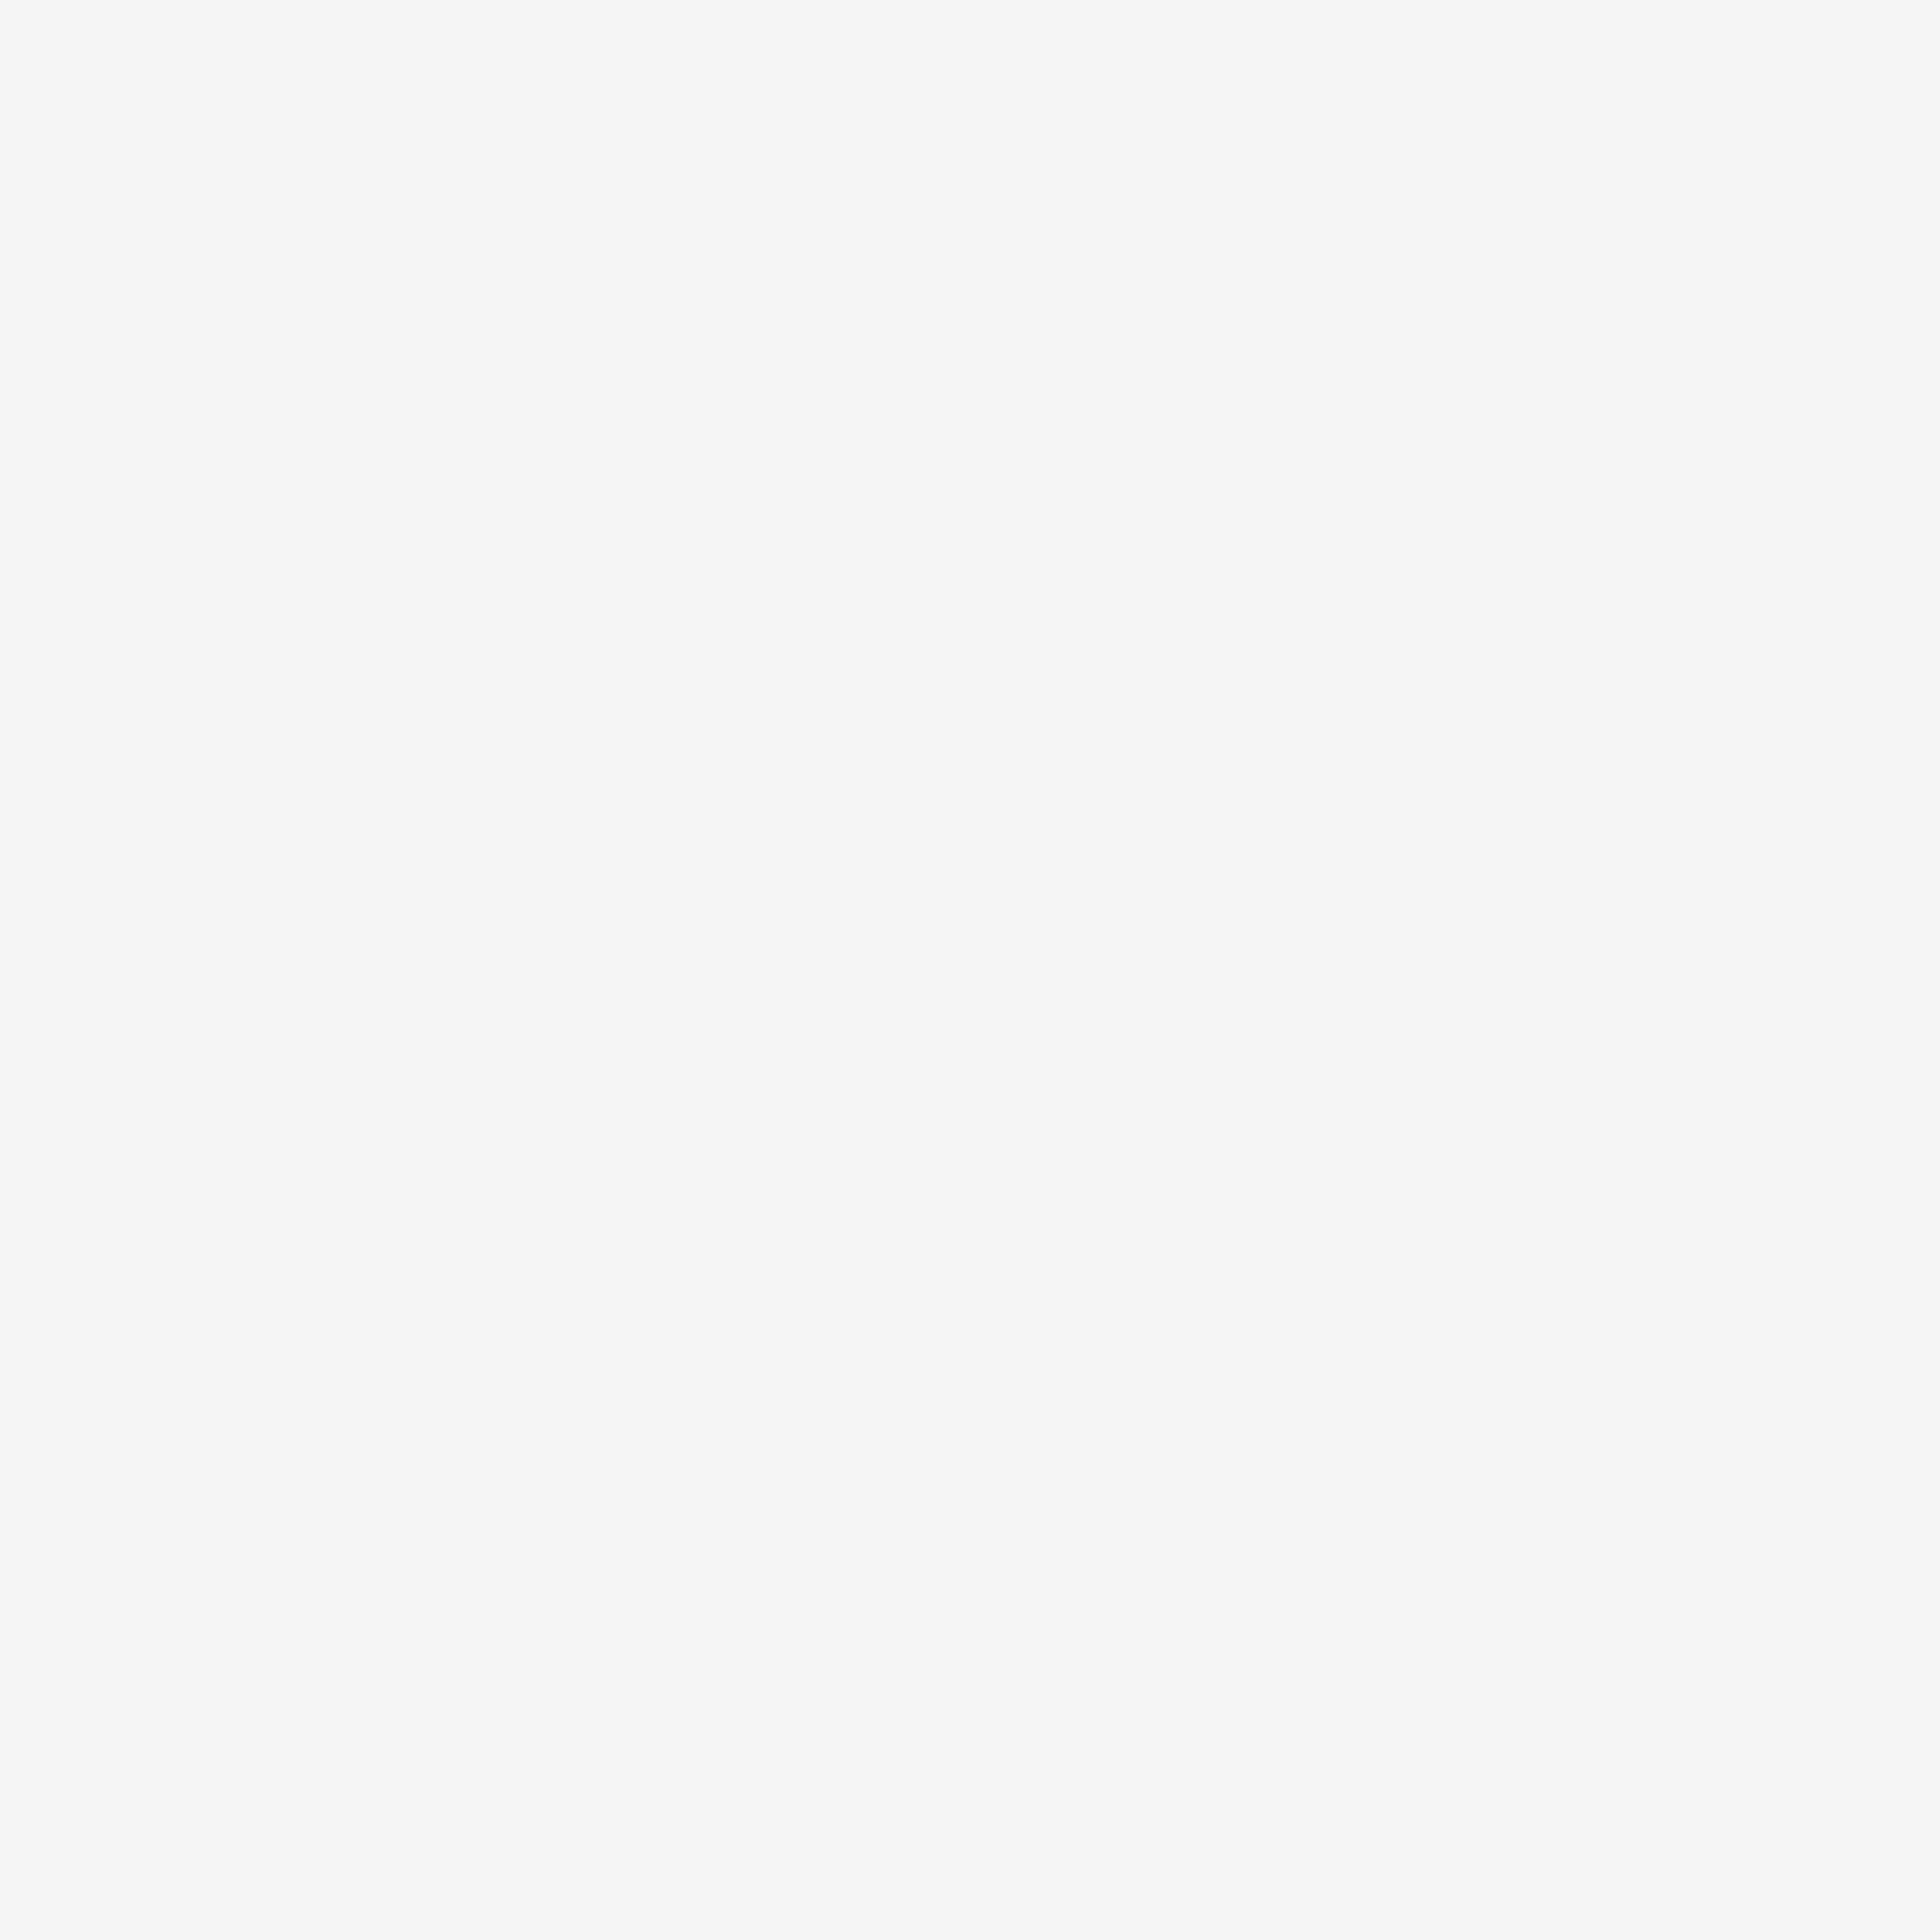 a08dde91142 Pinocchio 1116 order online   Oxener Shoes